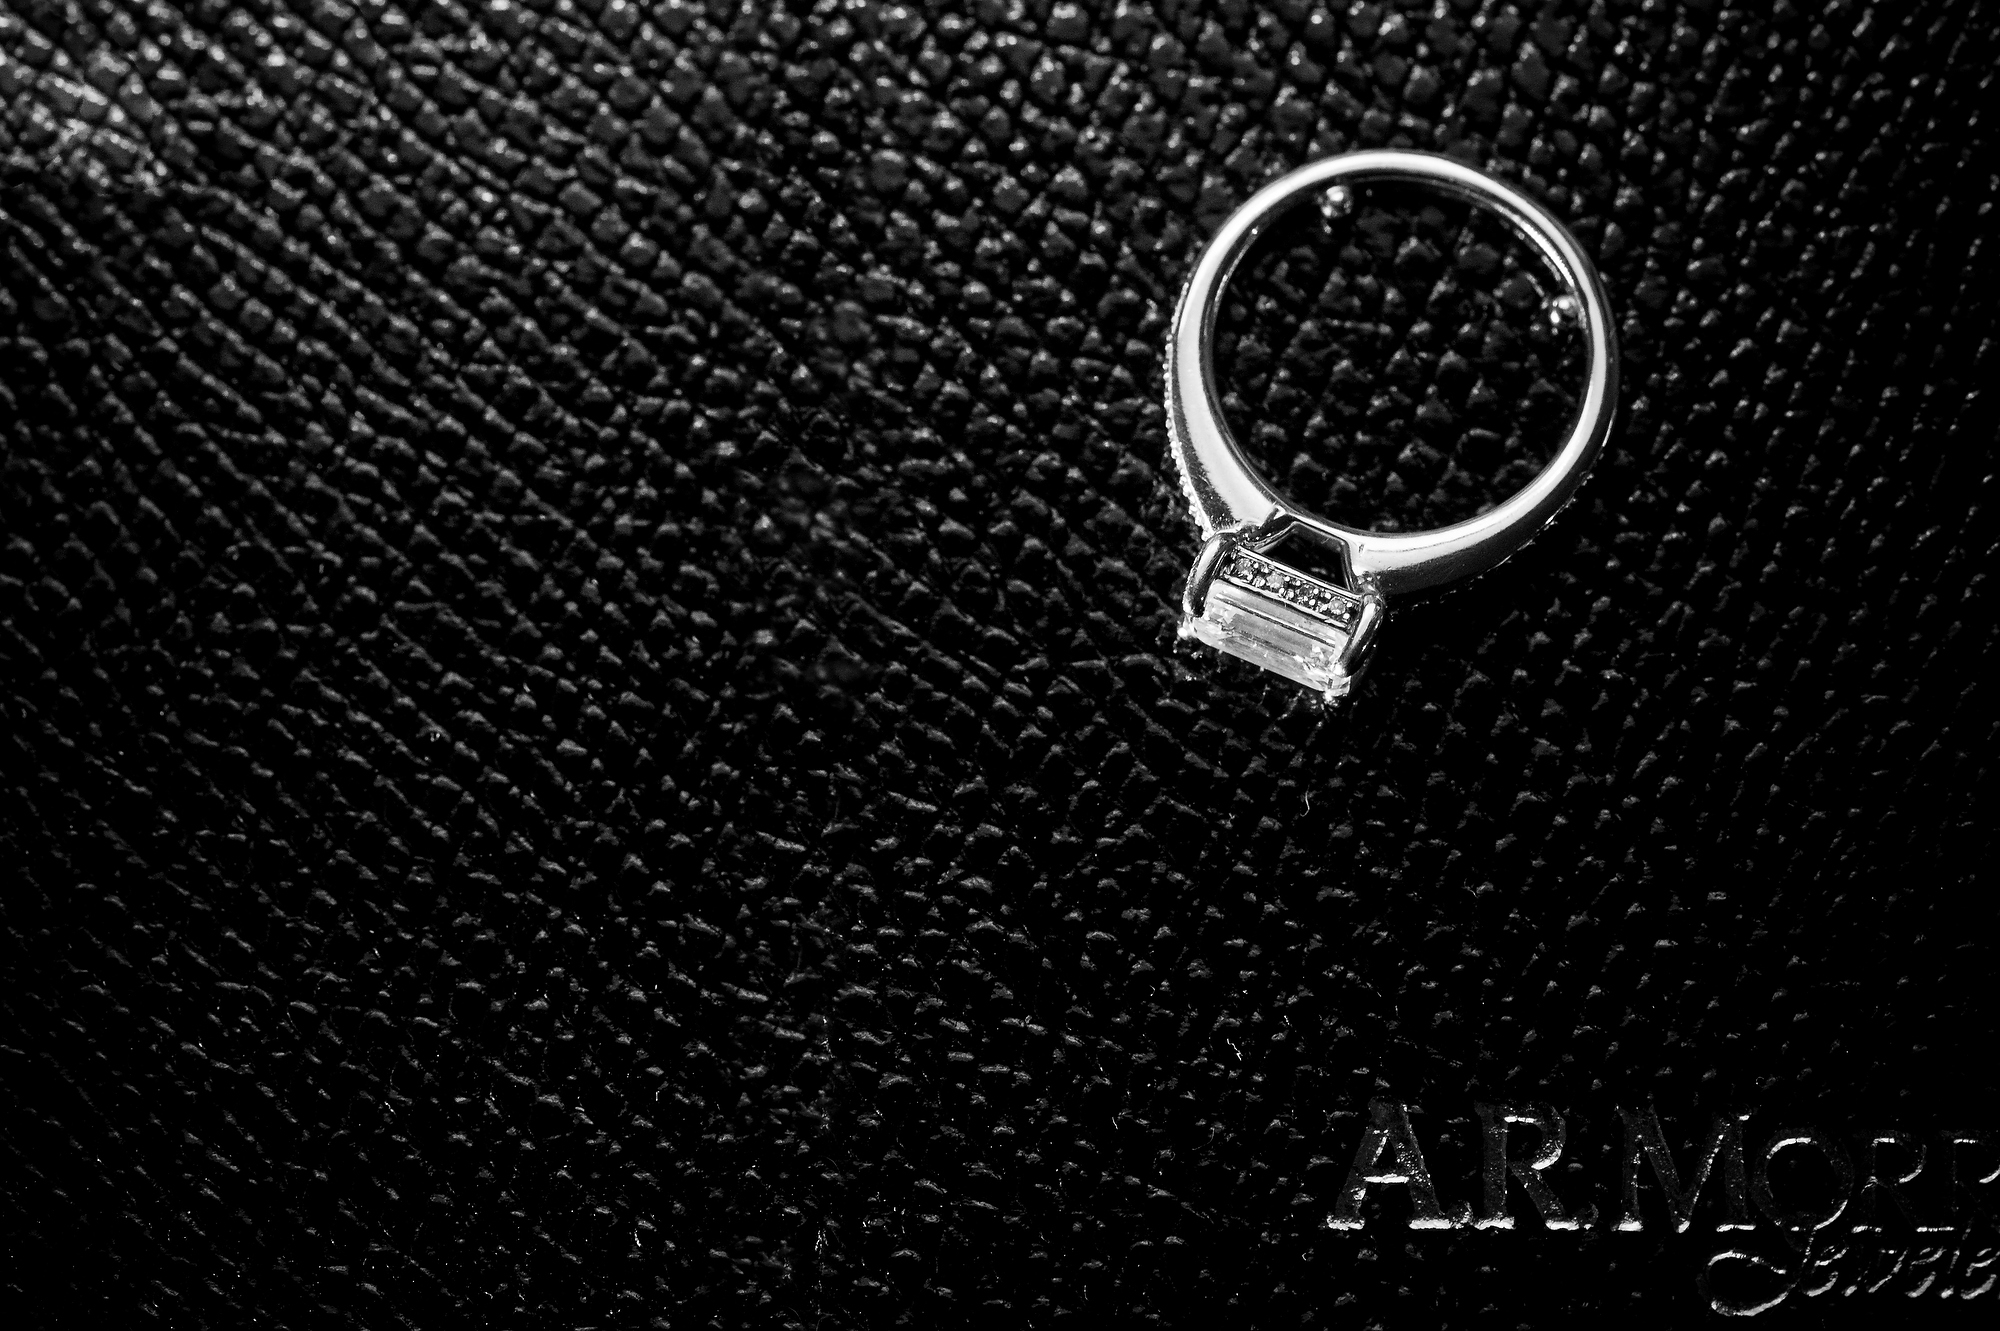 New Jersey Jewelry Photographer. Diamond engagement ring photoshoot. Creative Commercial Photographer.Landmark Image Group, LLC. David Lau